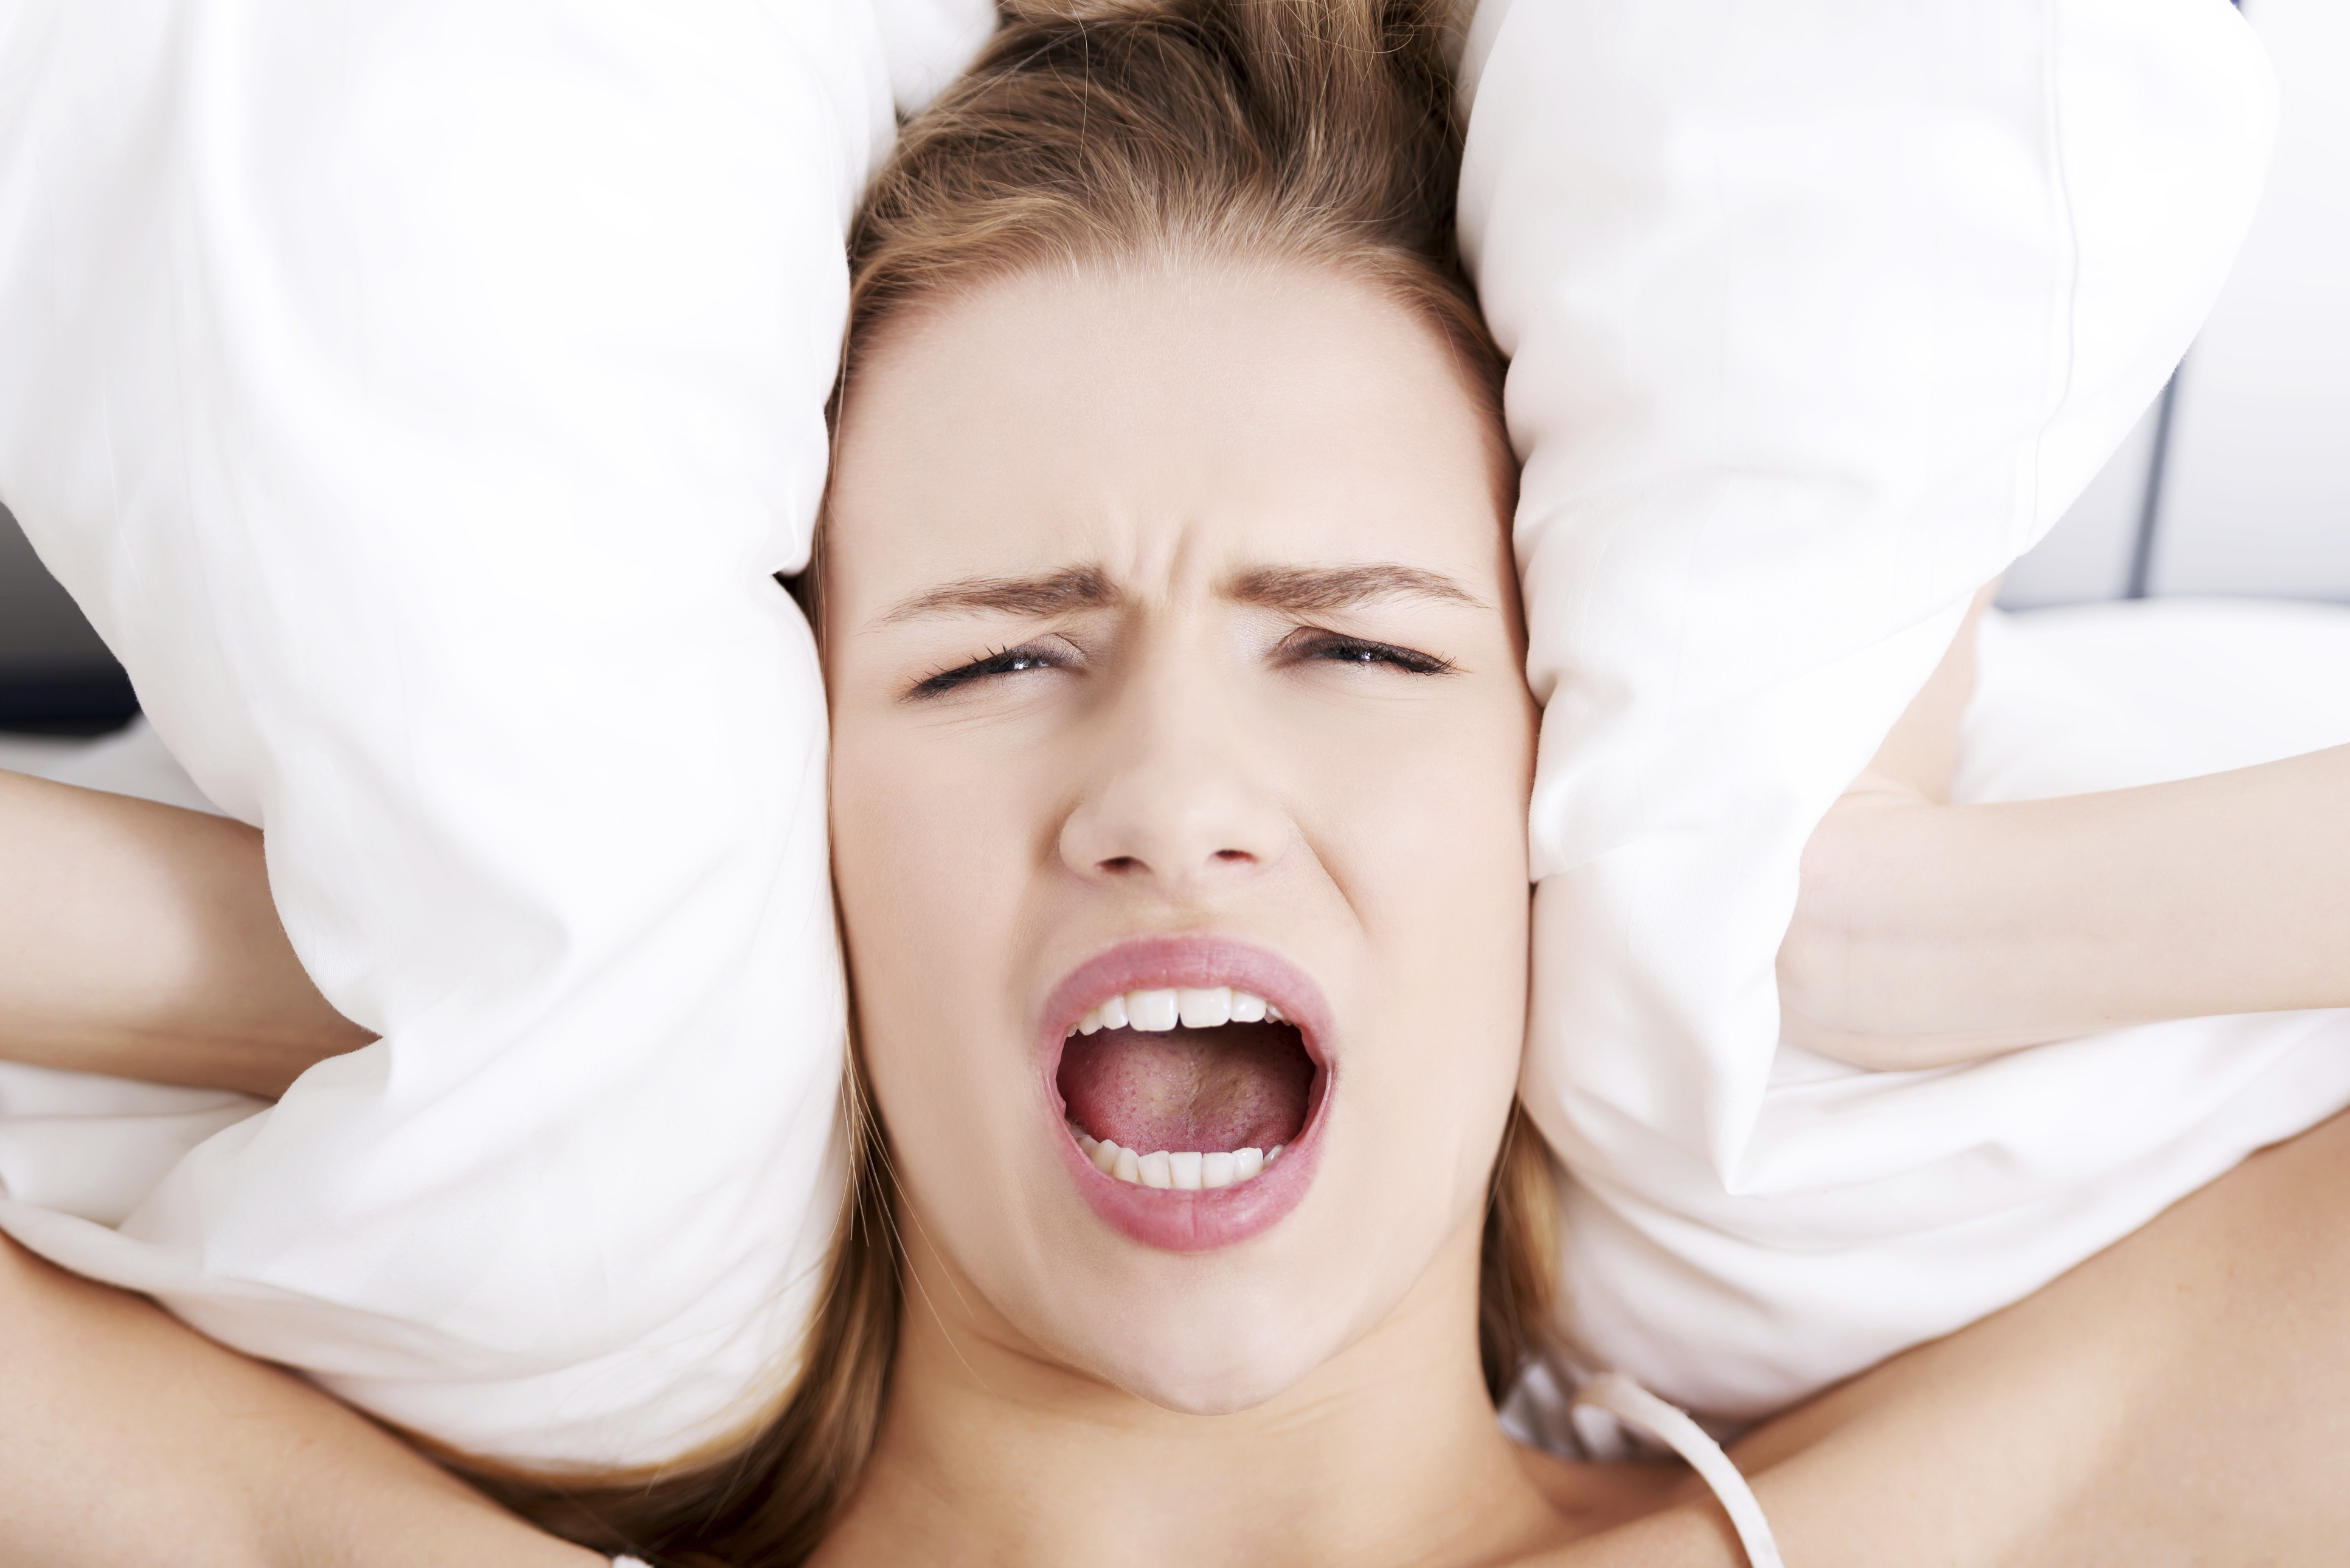 Snoring or sleep apnea?